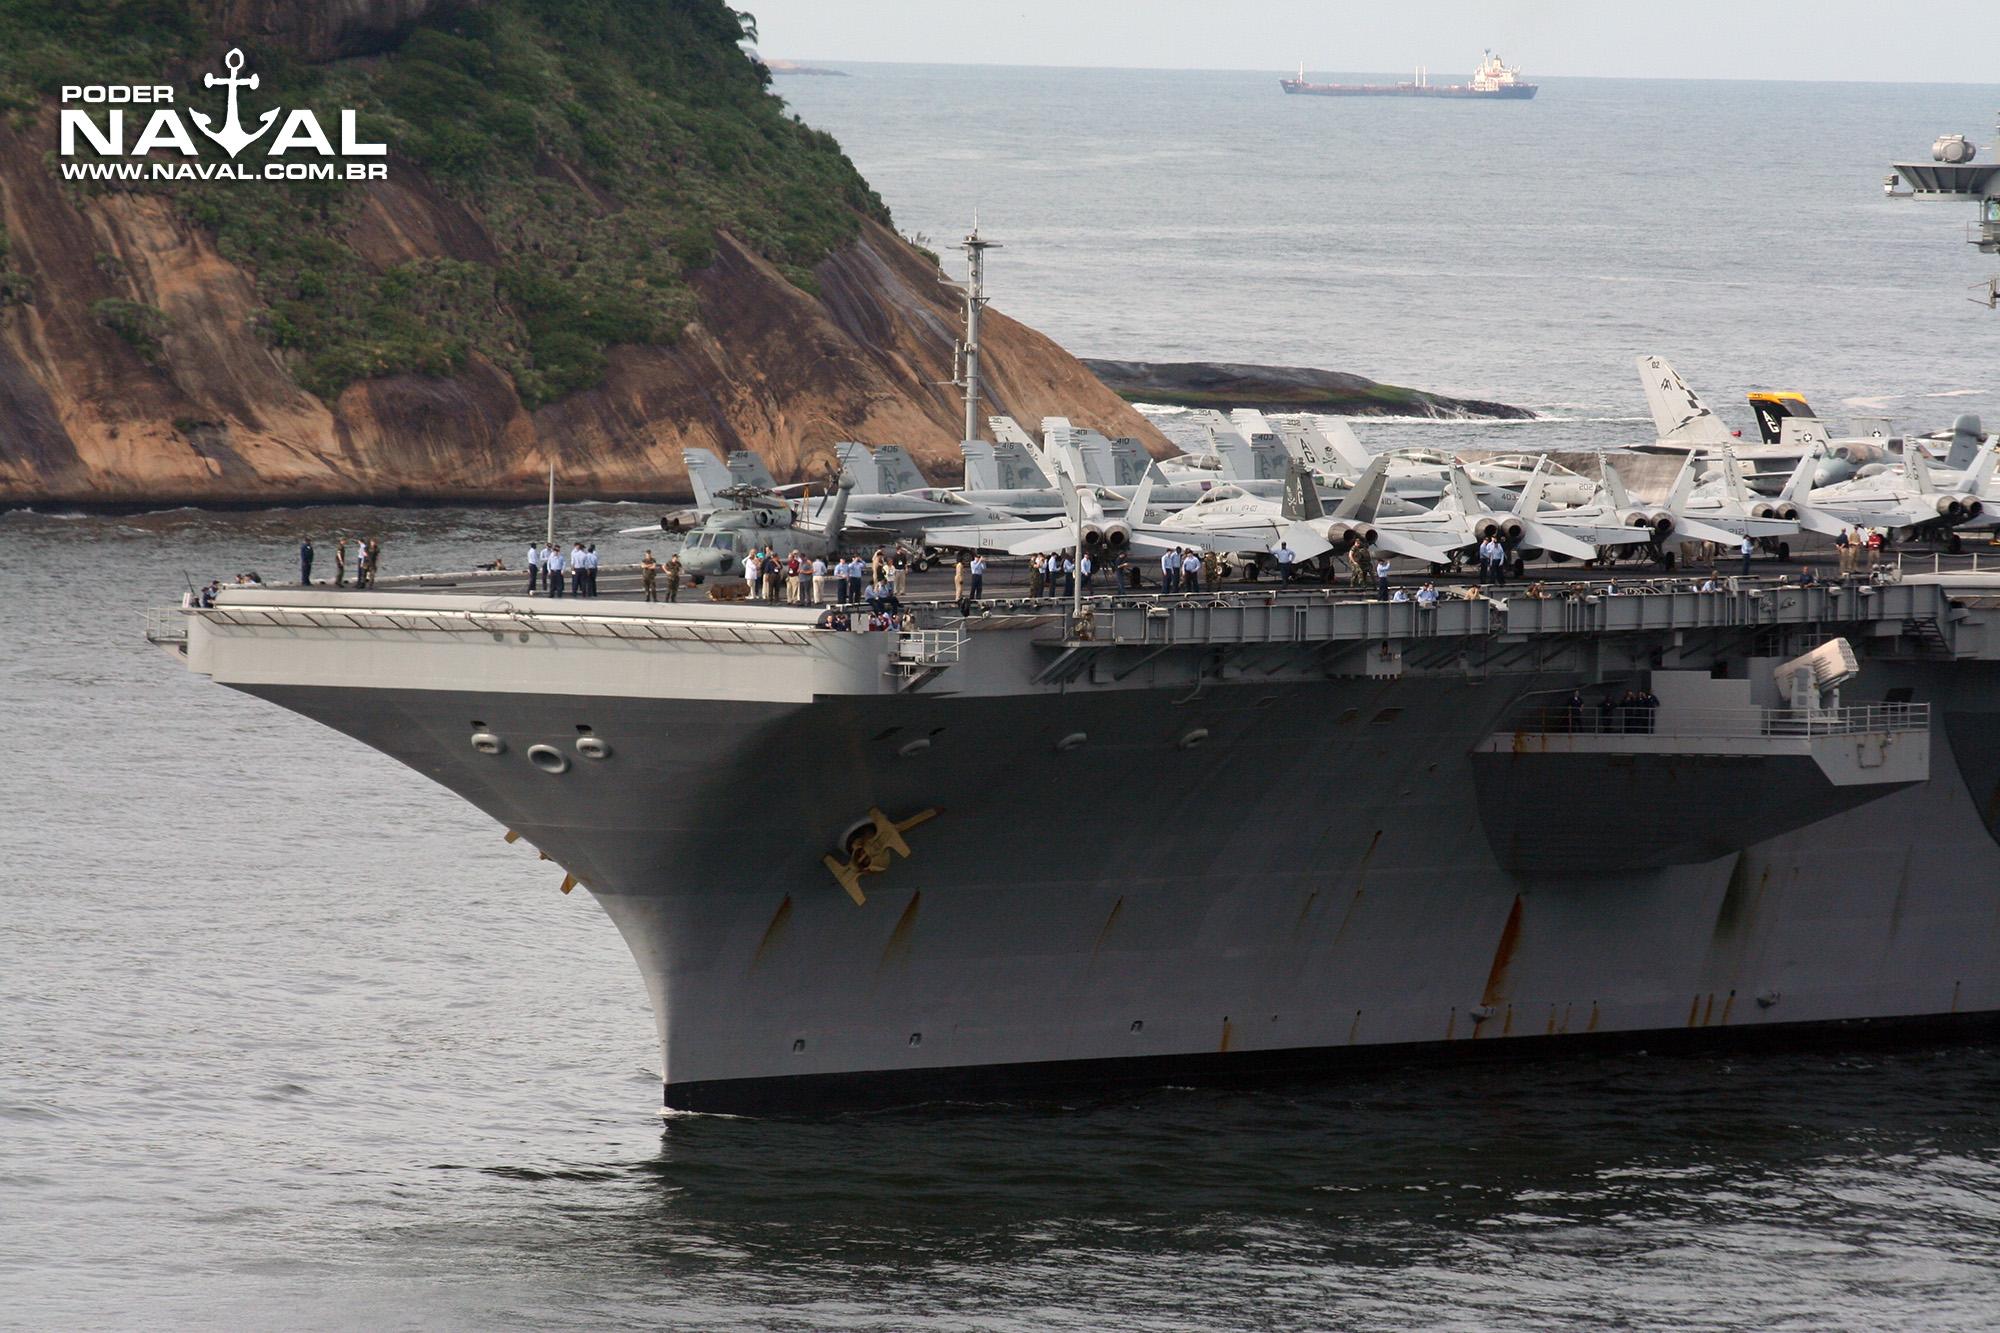 USS George Washington (CVN-73) no Rio - 2008 - 5a